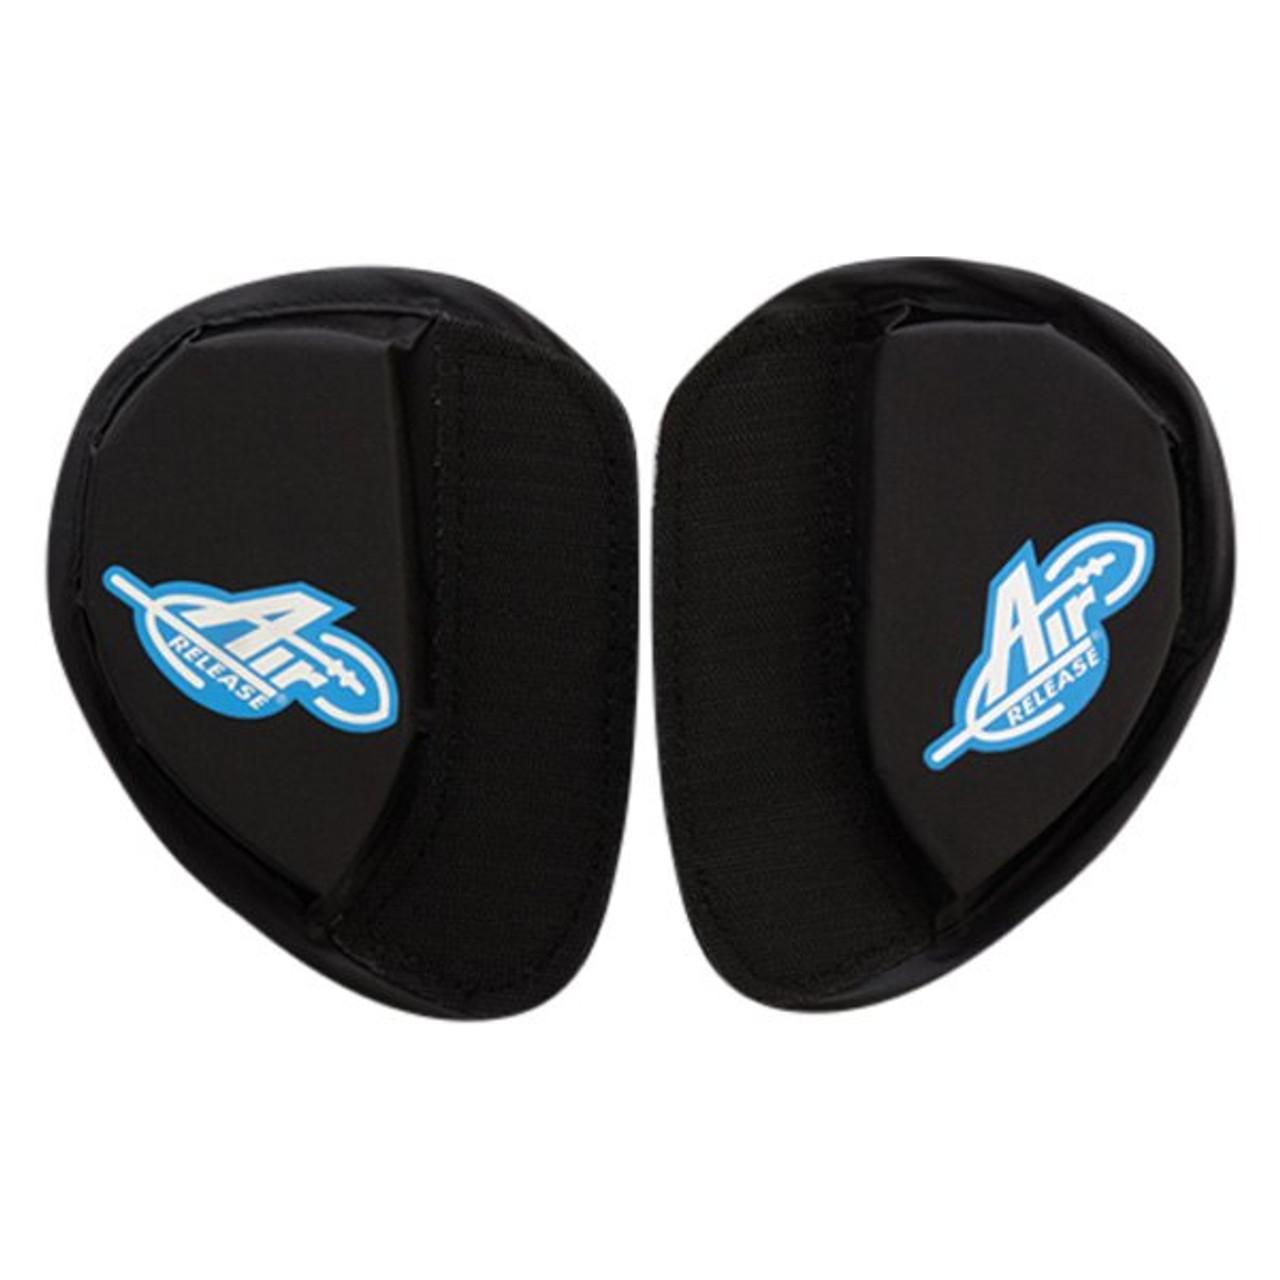 Z-Cool Deltoid Pads - Pair